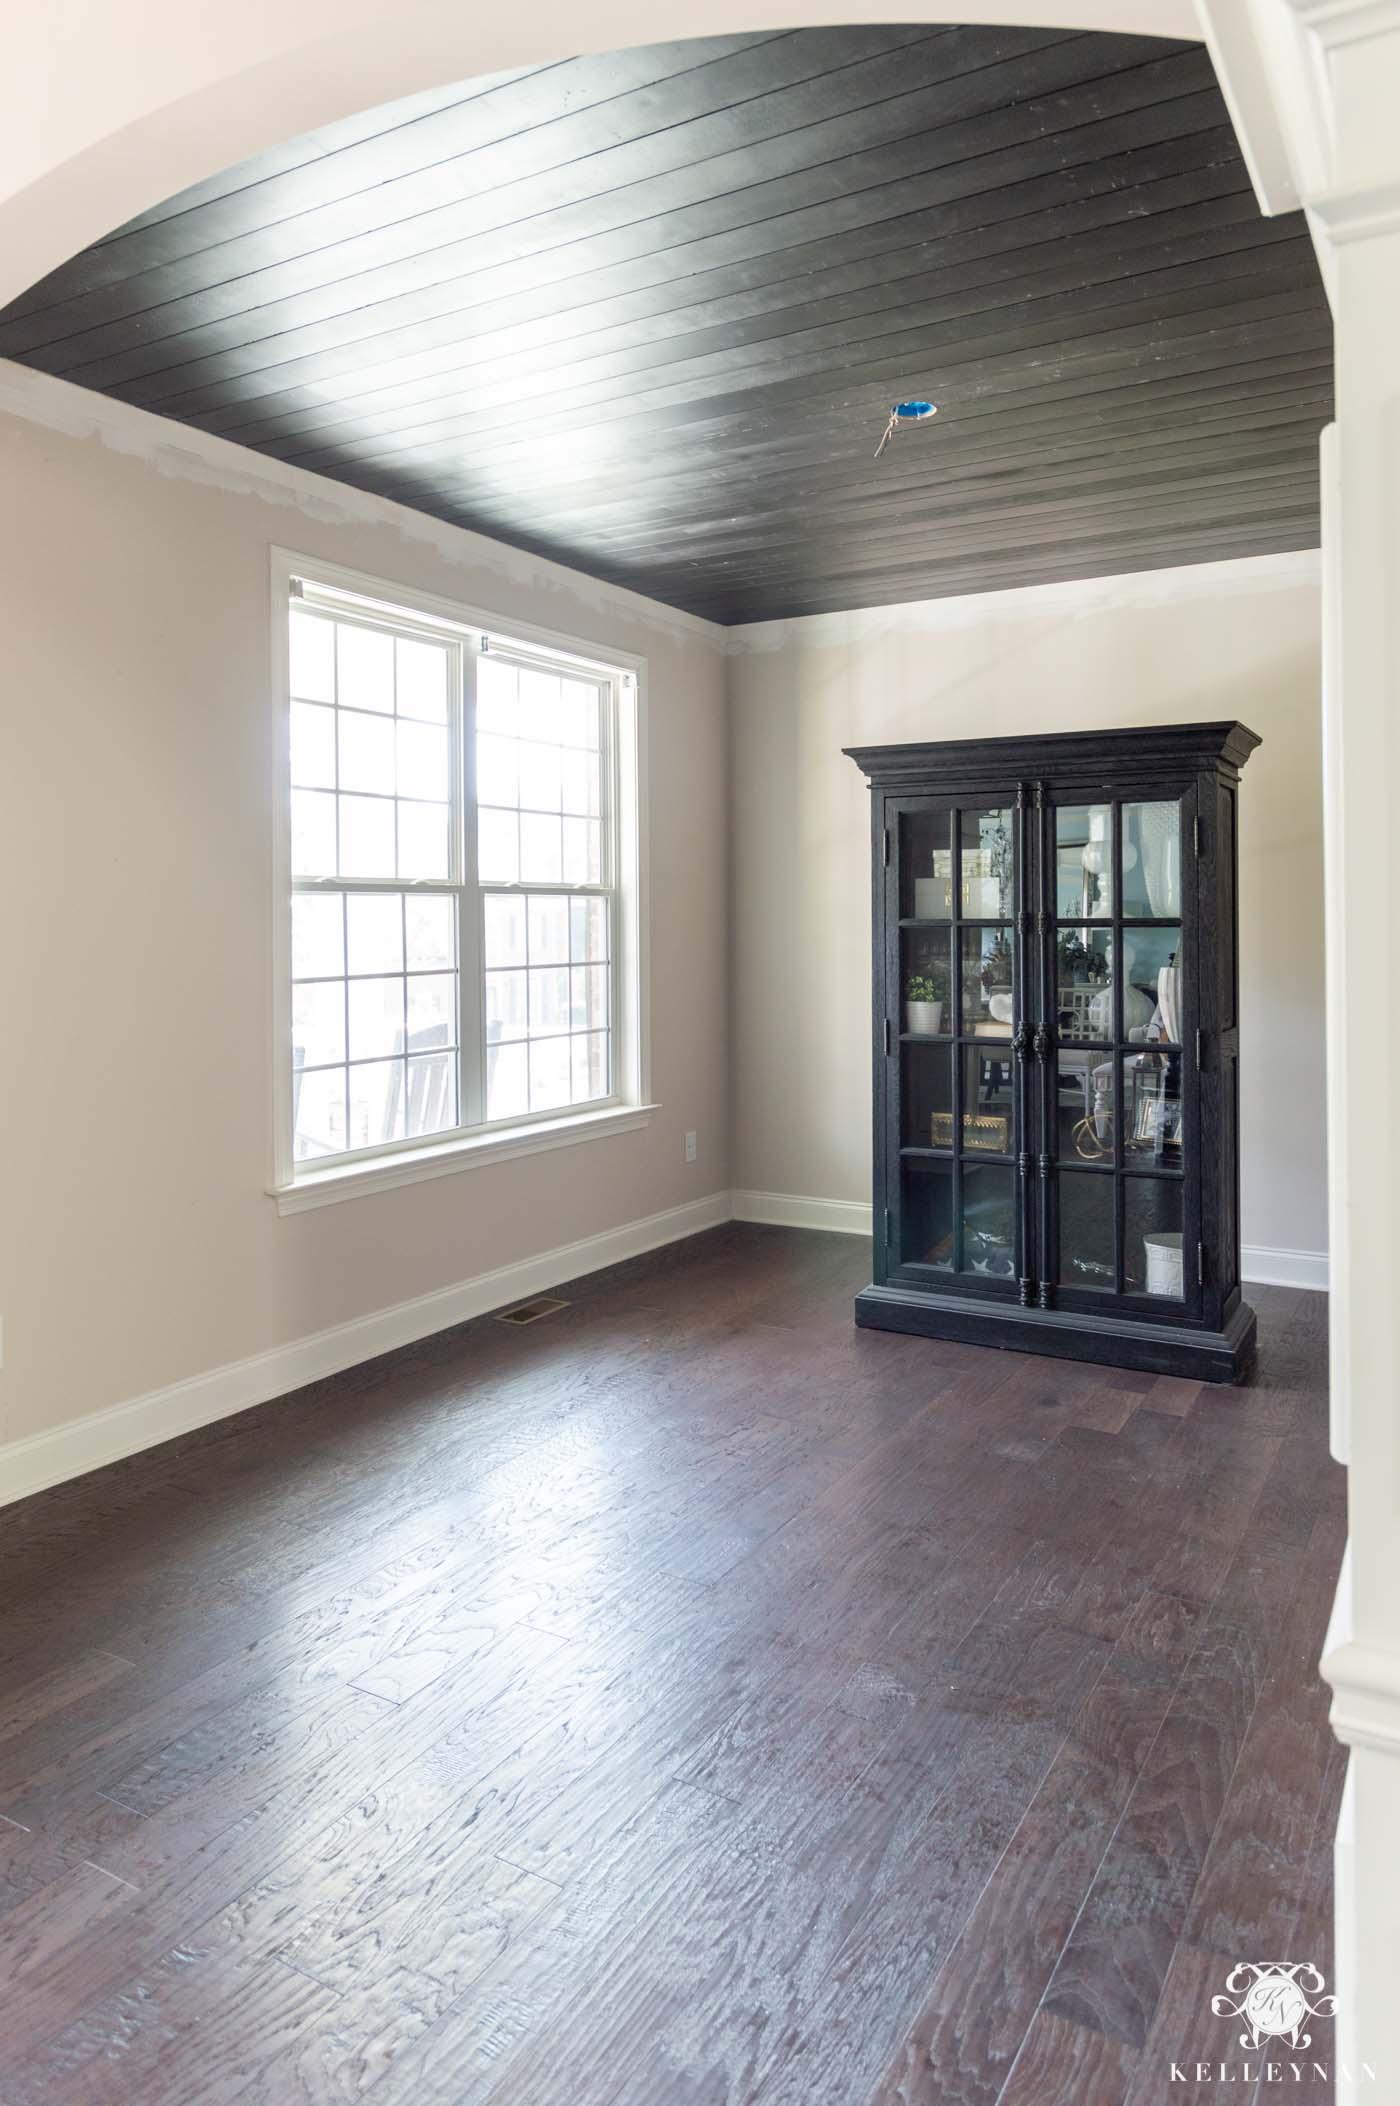 Room Makeover Progress: Black Shiplap Ceiling